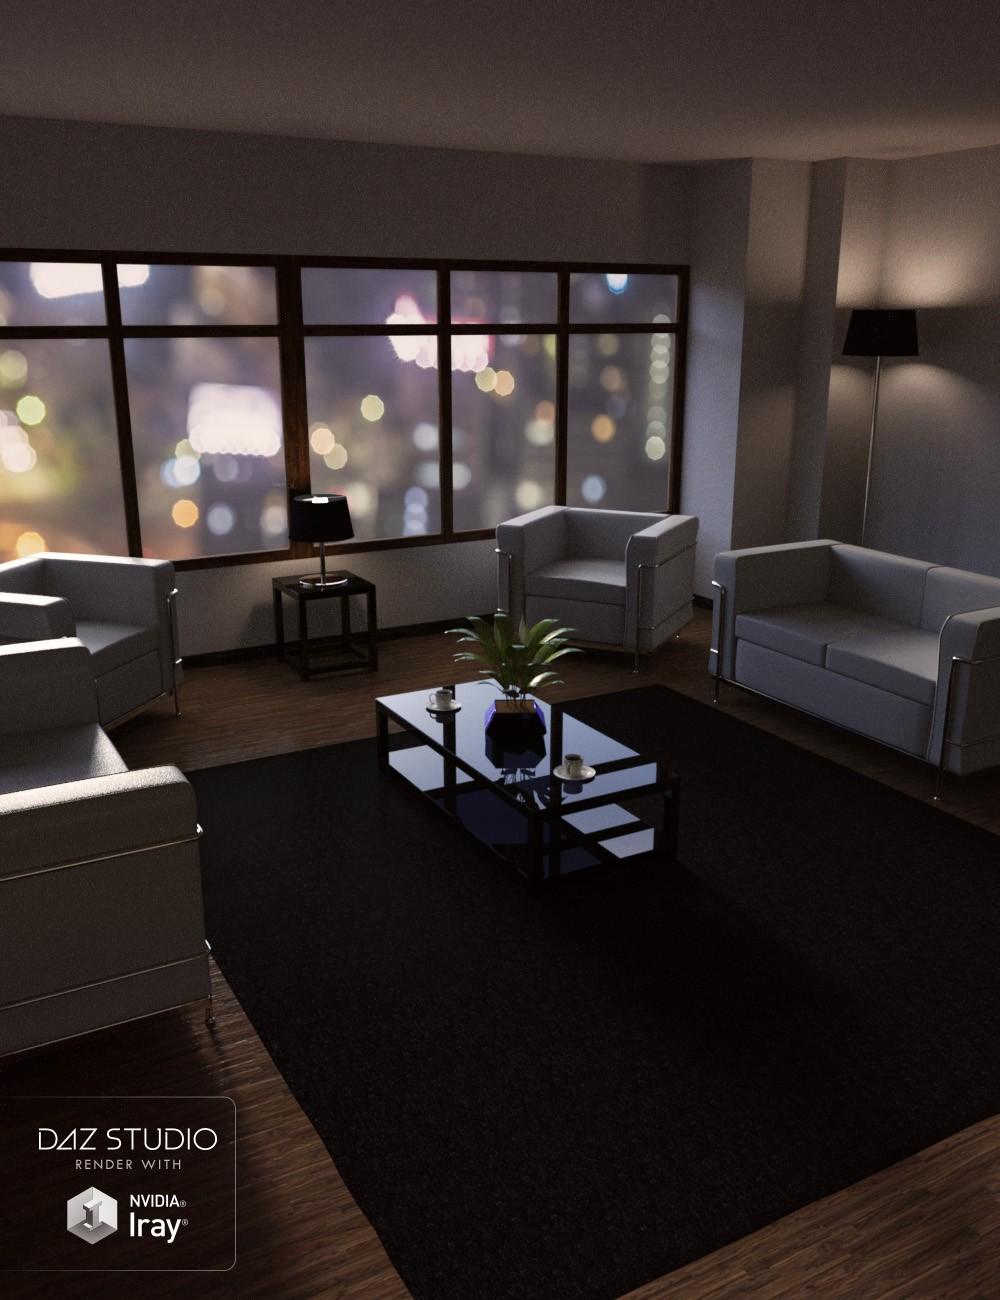 Download daz studio 3 for free daz 3d sleek interior room for Living room 2 for daz studio